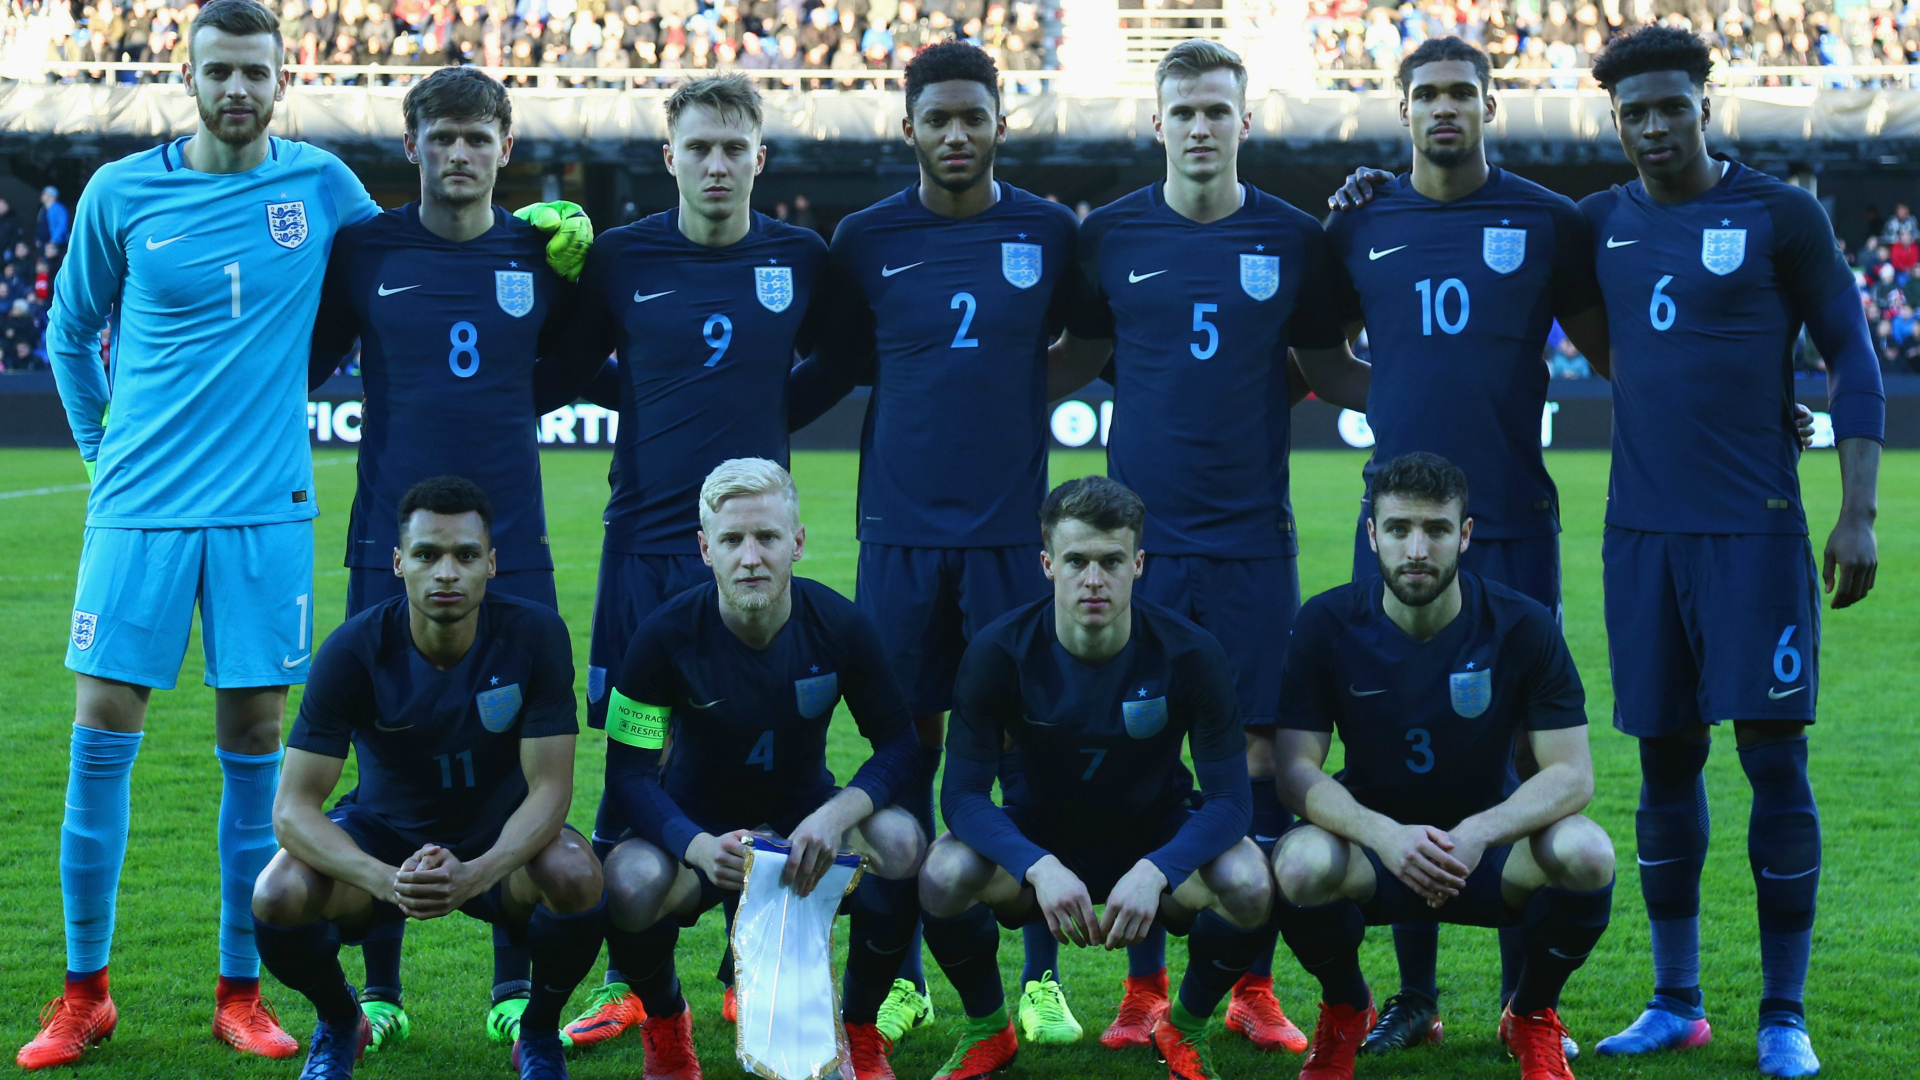 England U21 squad